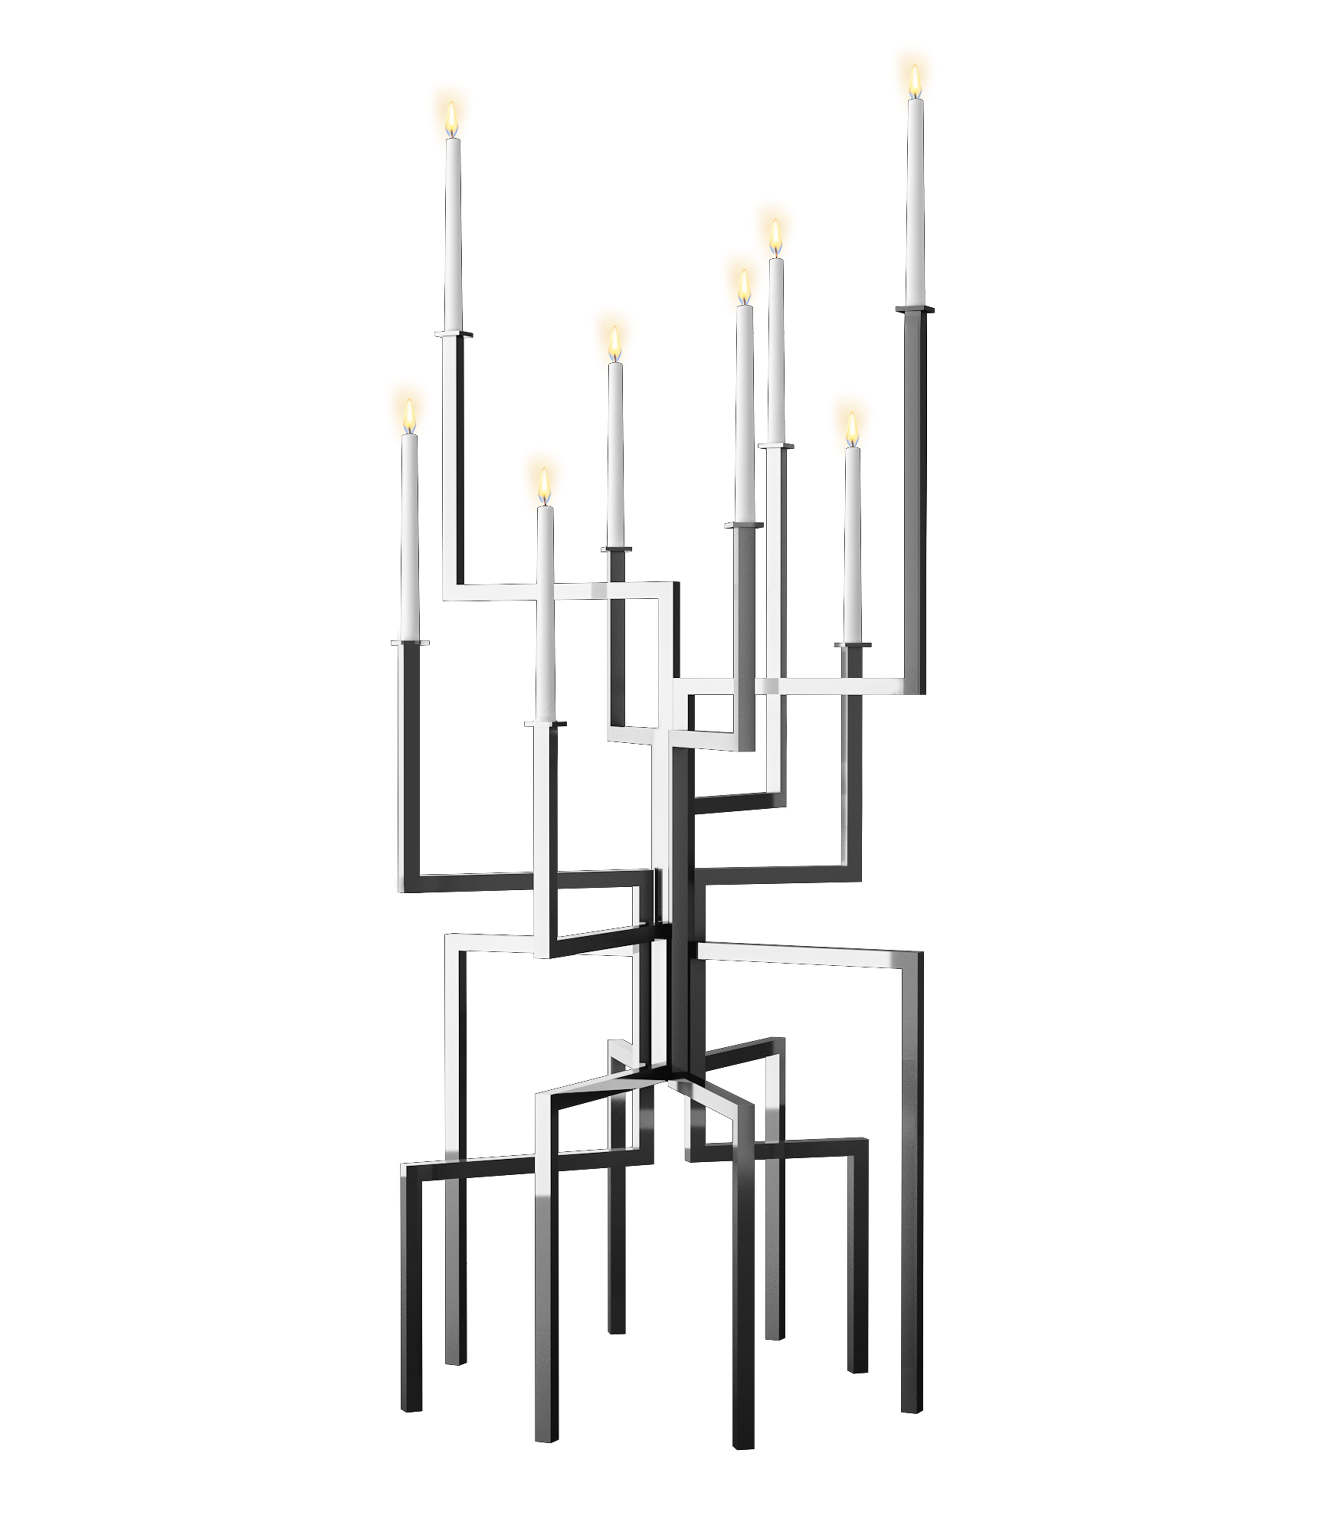 Extra Large 6 Modern Geometric Candelabra Candle Holder Candleholder Fixture Designer Jennava Laska Portfolio Furniture Sculpture Film